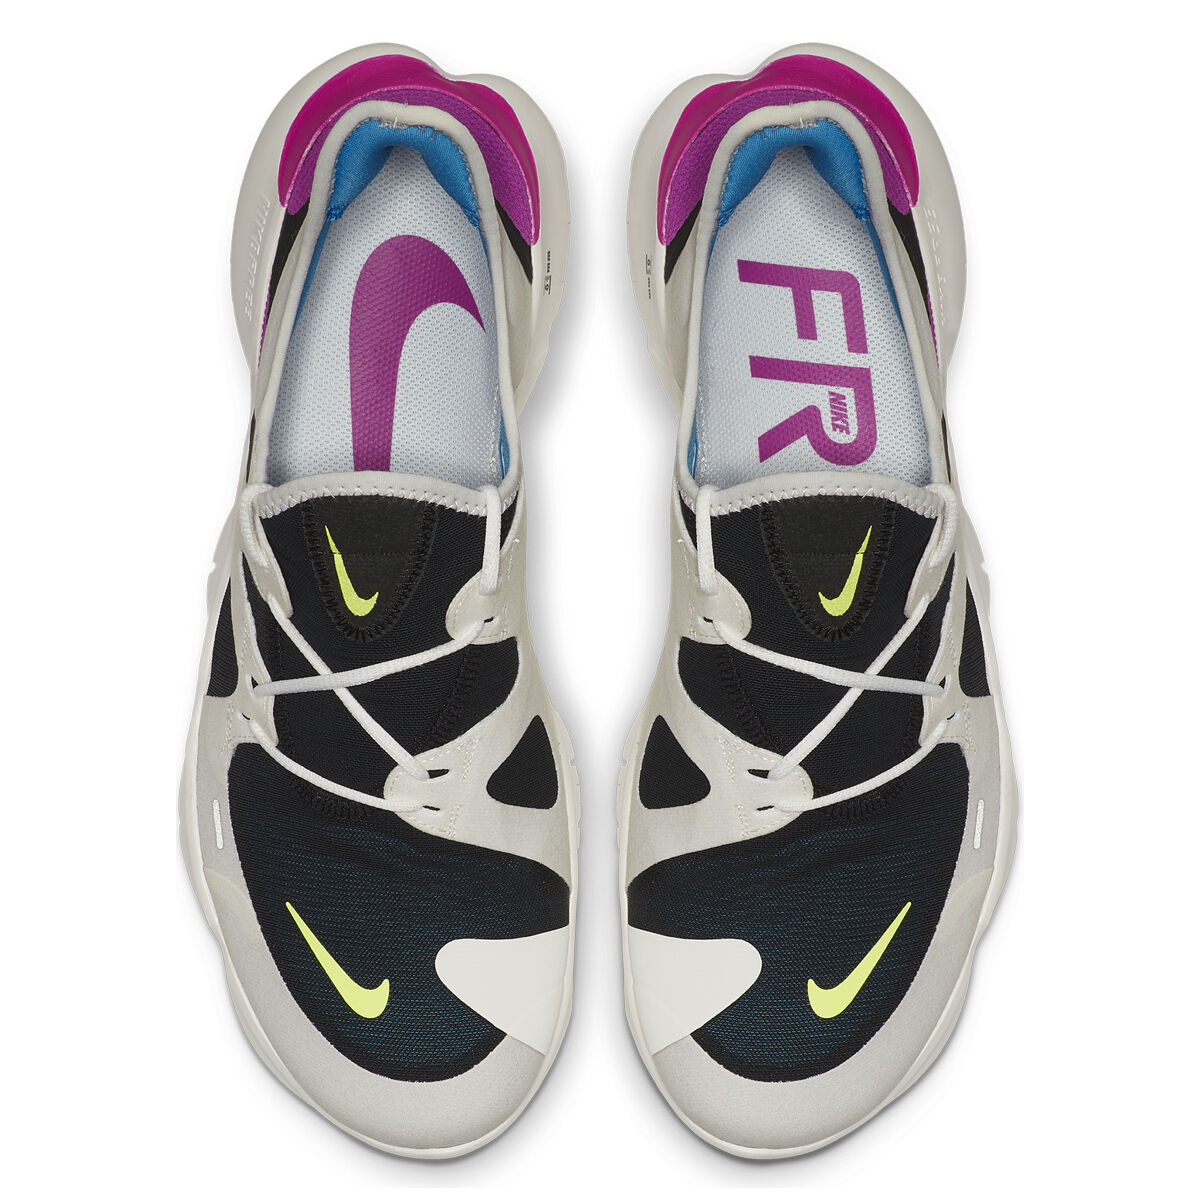 Nike Free RN 5.0 Mens Running Shoes